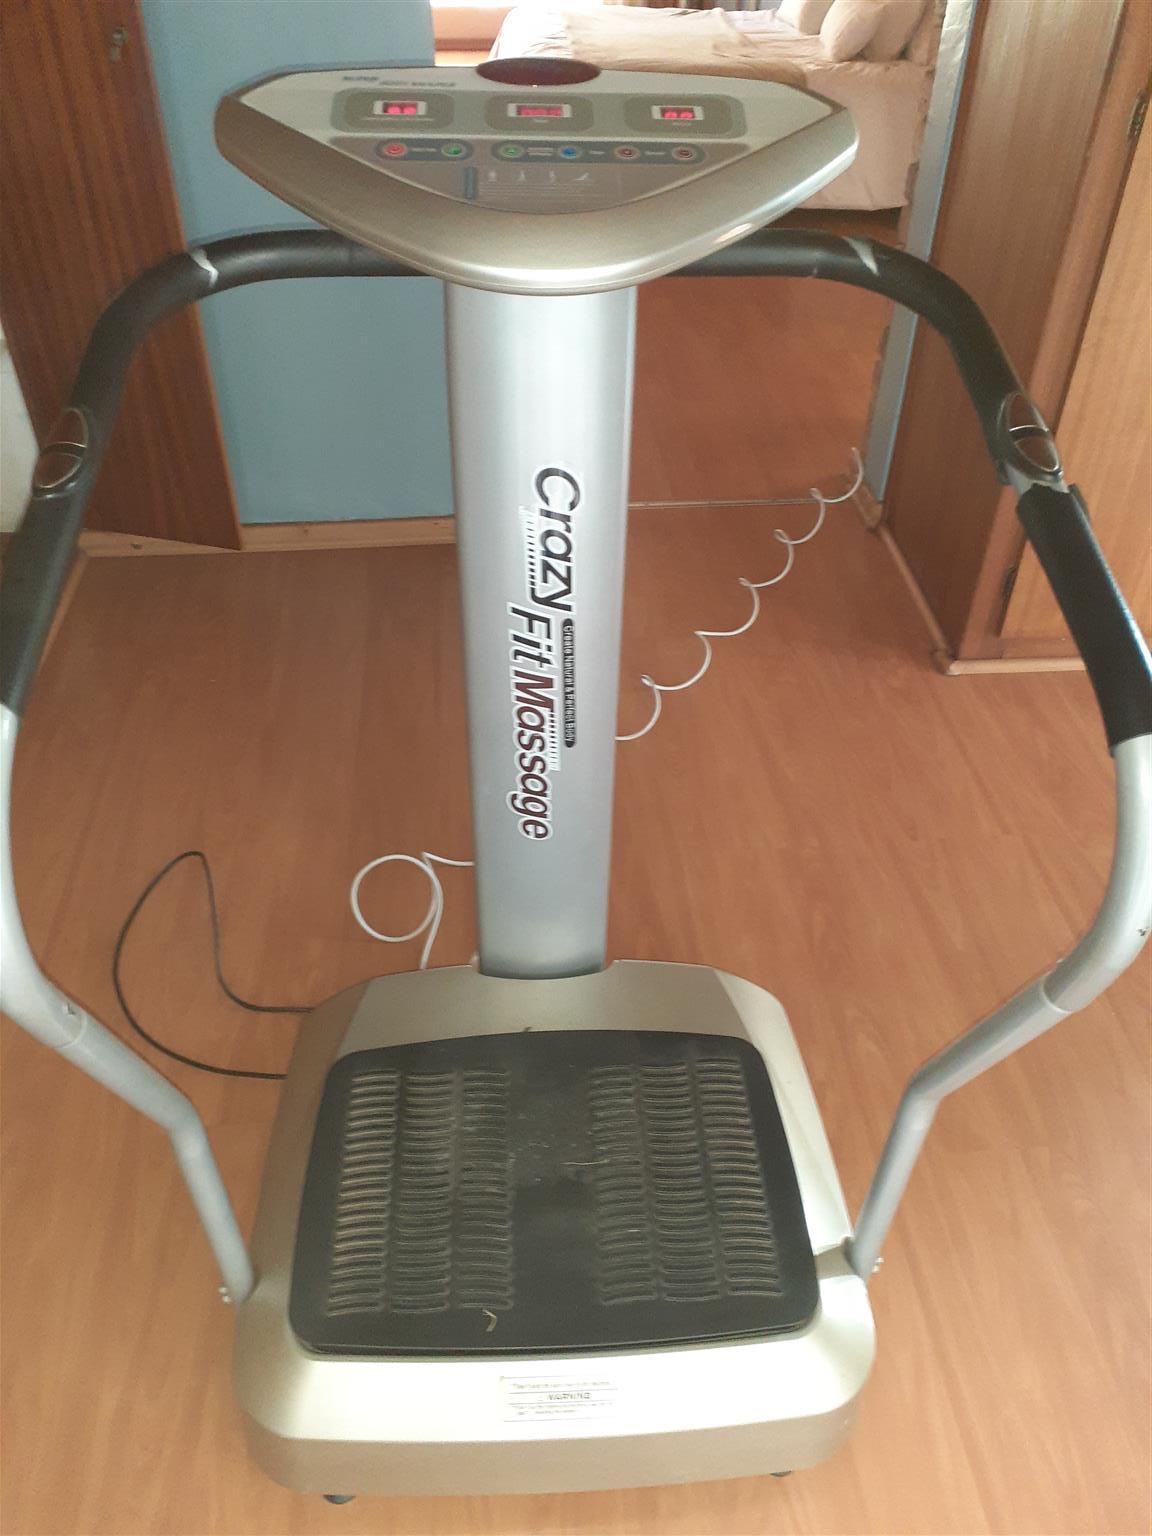 Body shaper machine